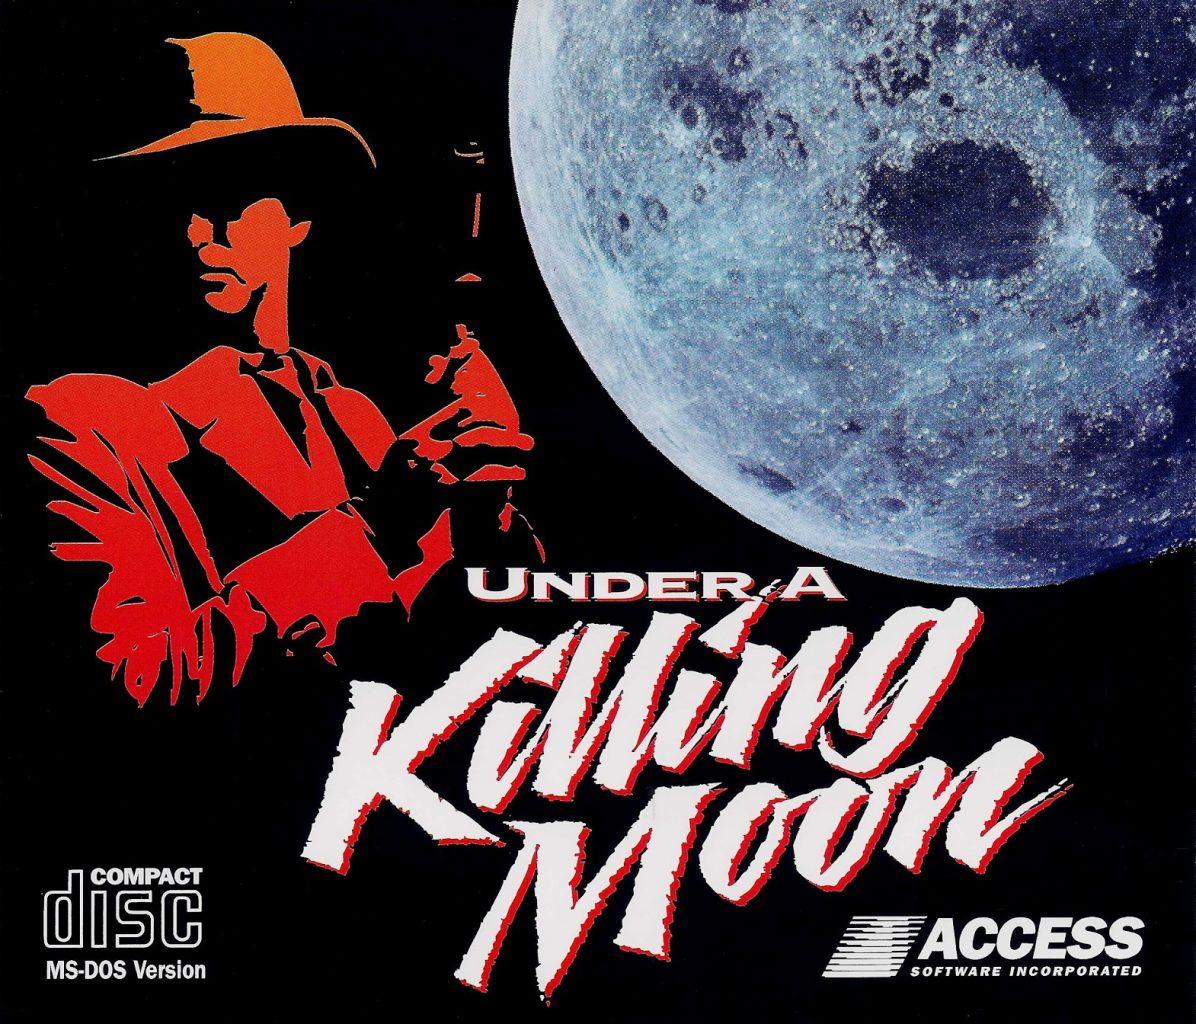 Under a Killing Moon